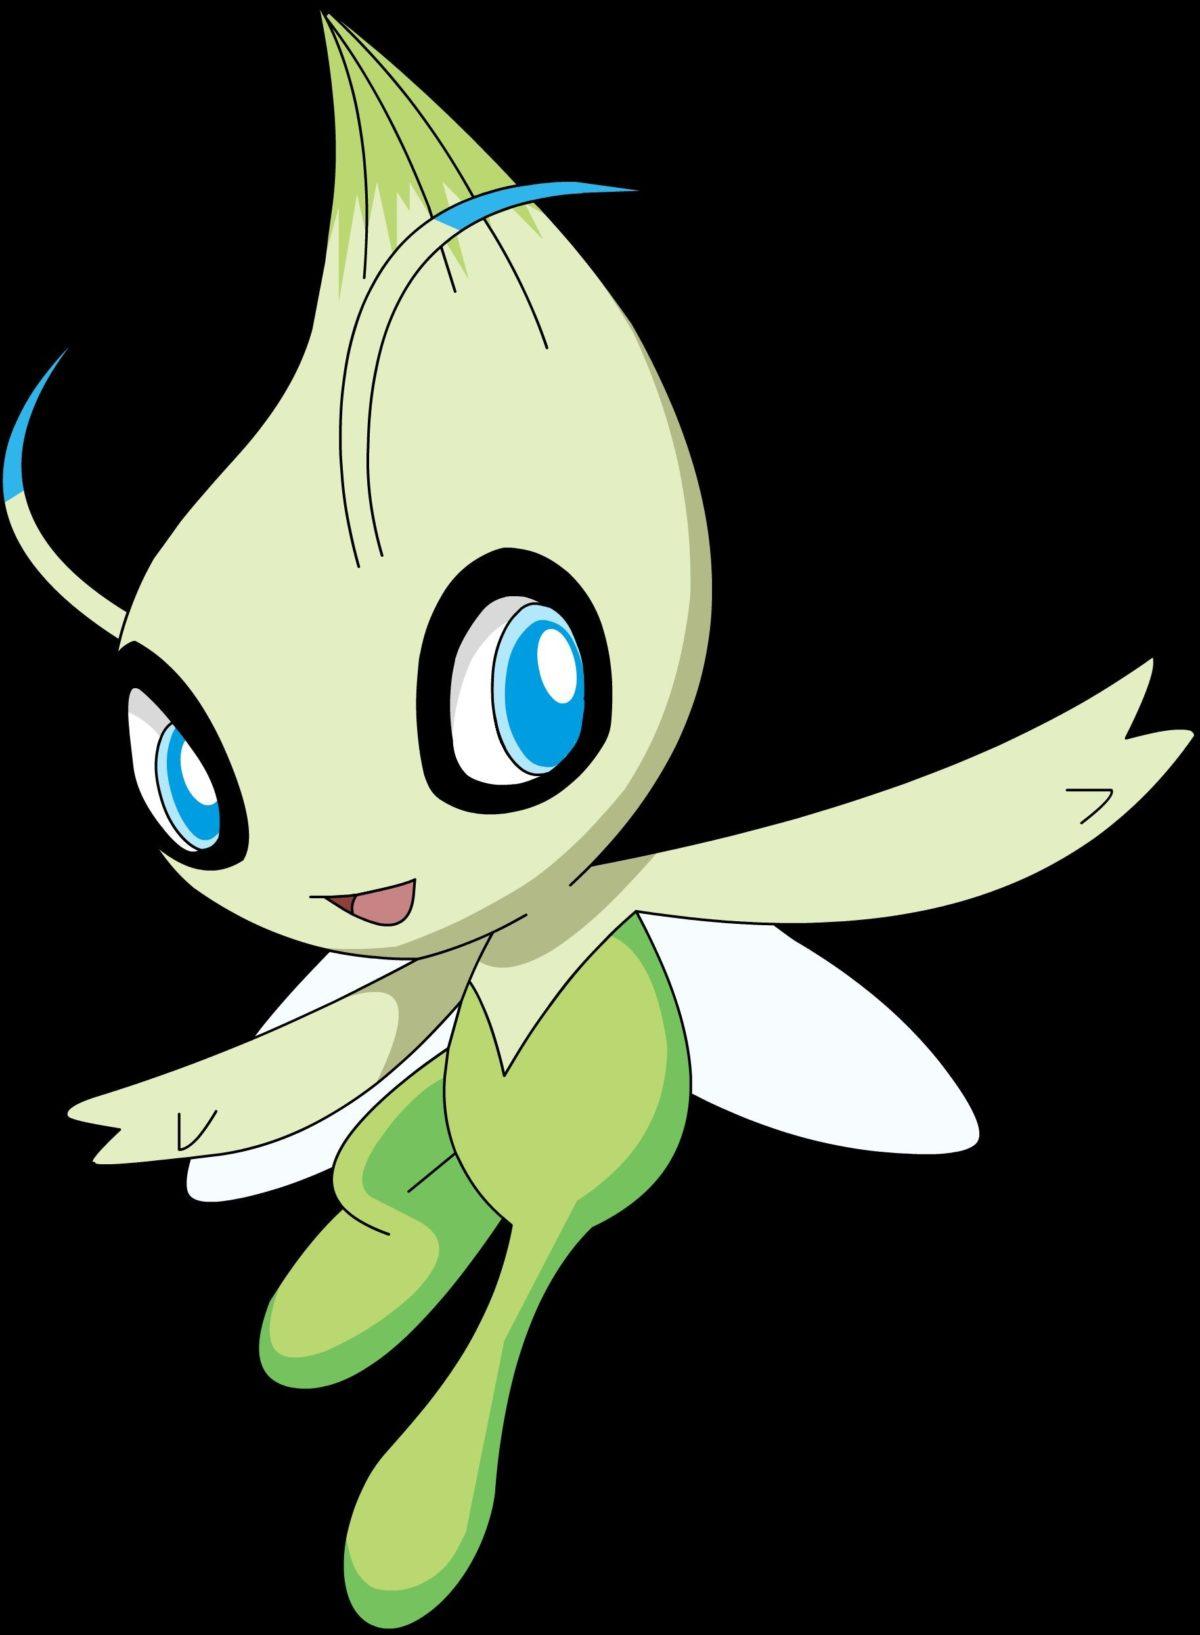 Beautiful Celebi Pokemon | ALTERNATIVAAZAPATERO.ORG